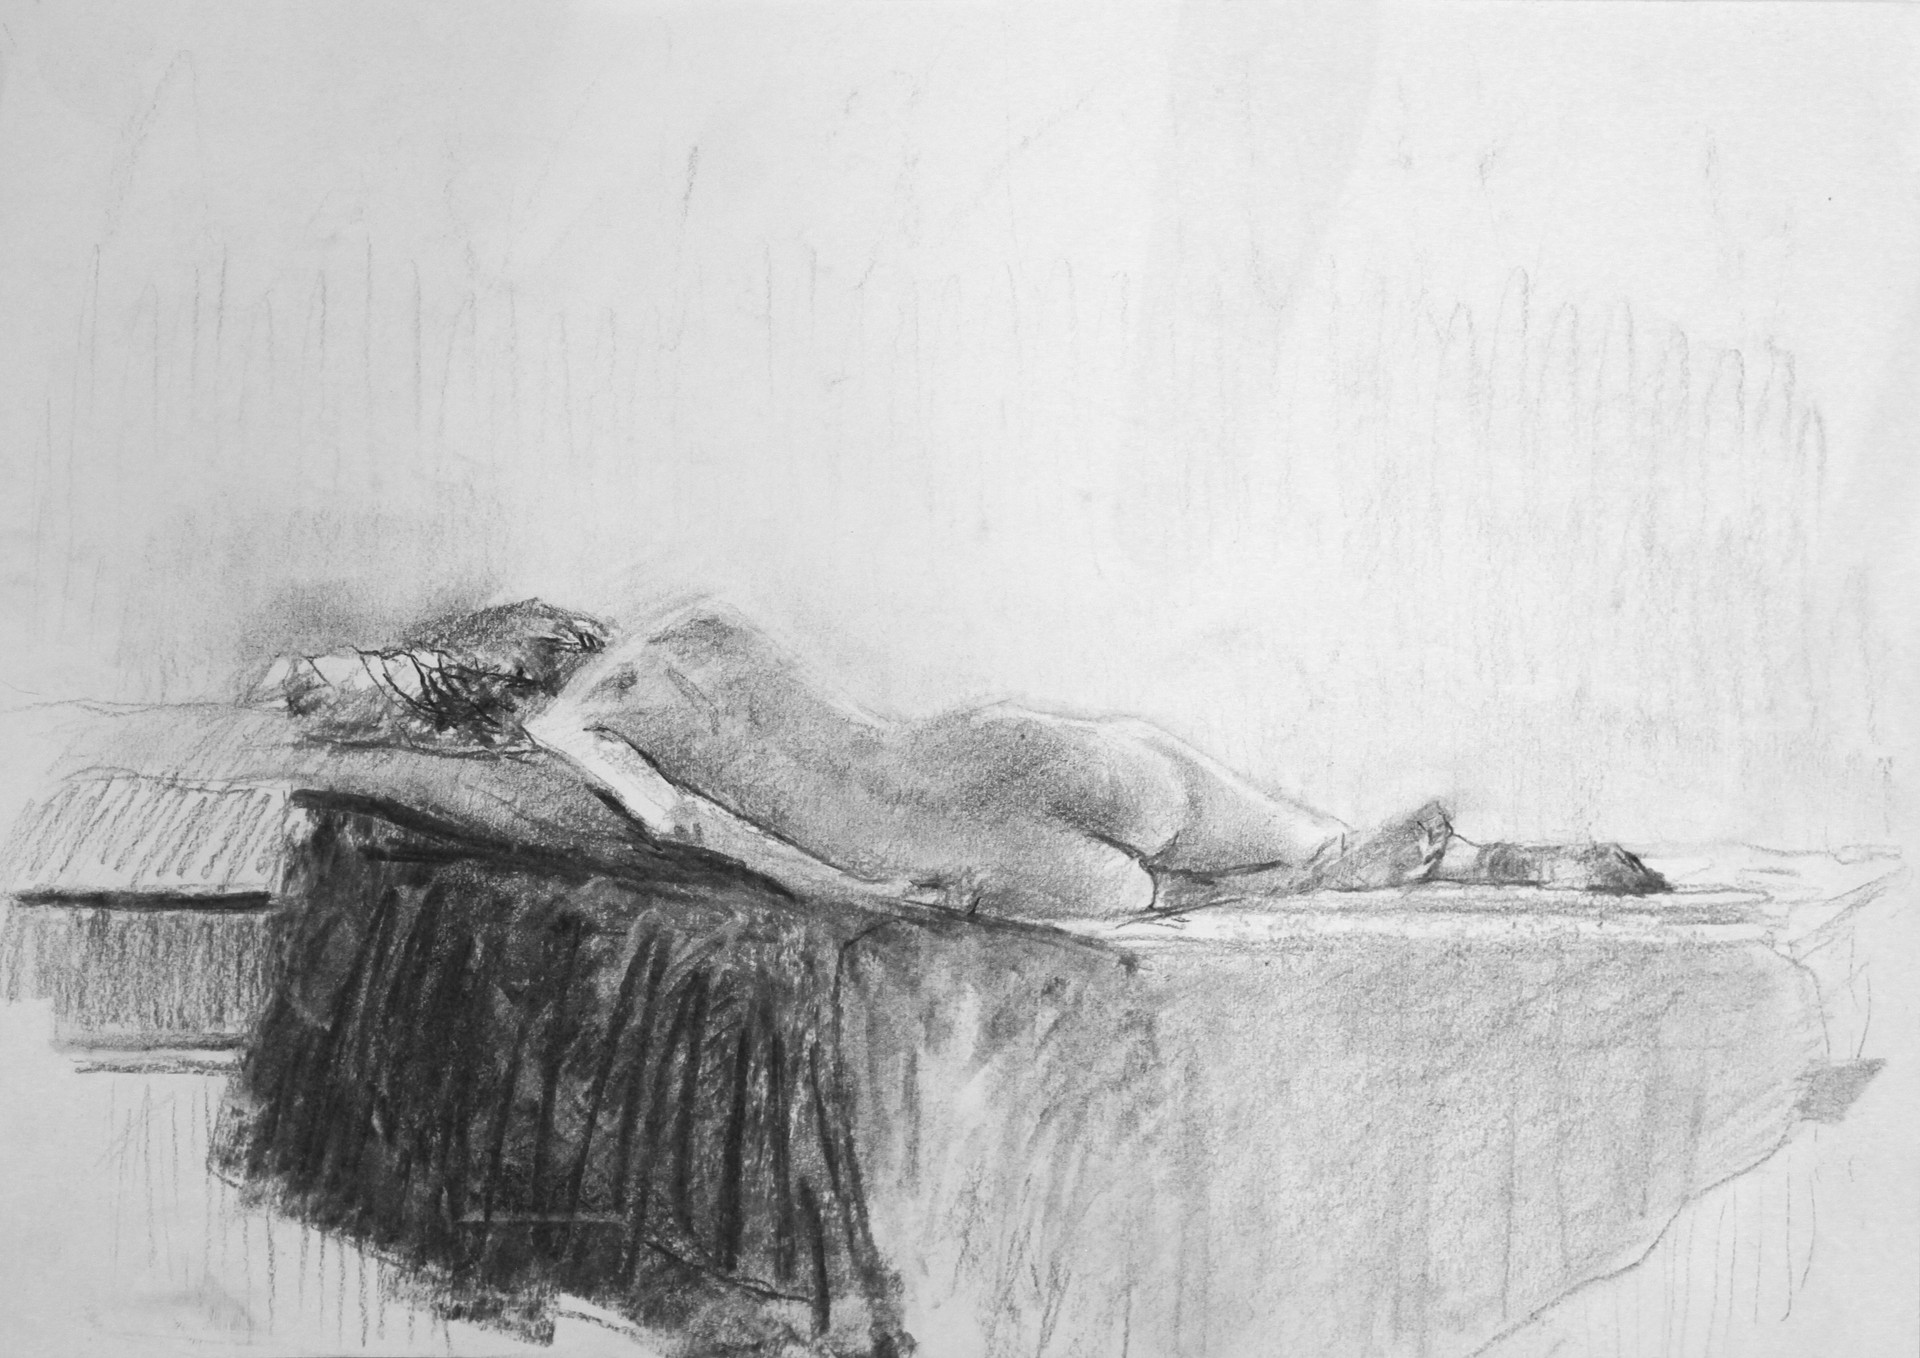 Study, graphite on paper, 42 x 29.7 cm, 2017